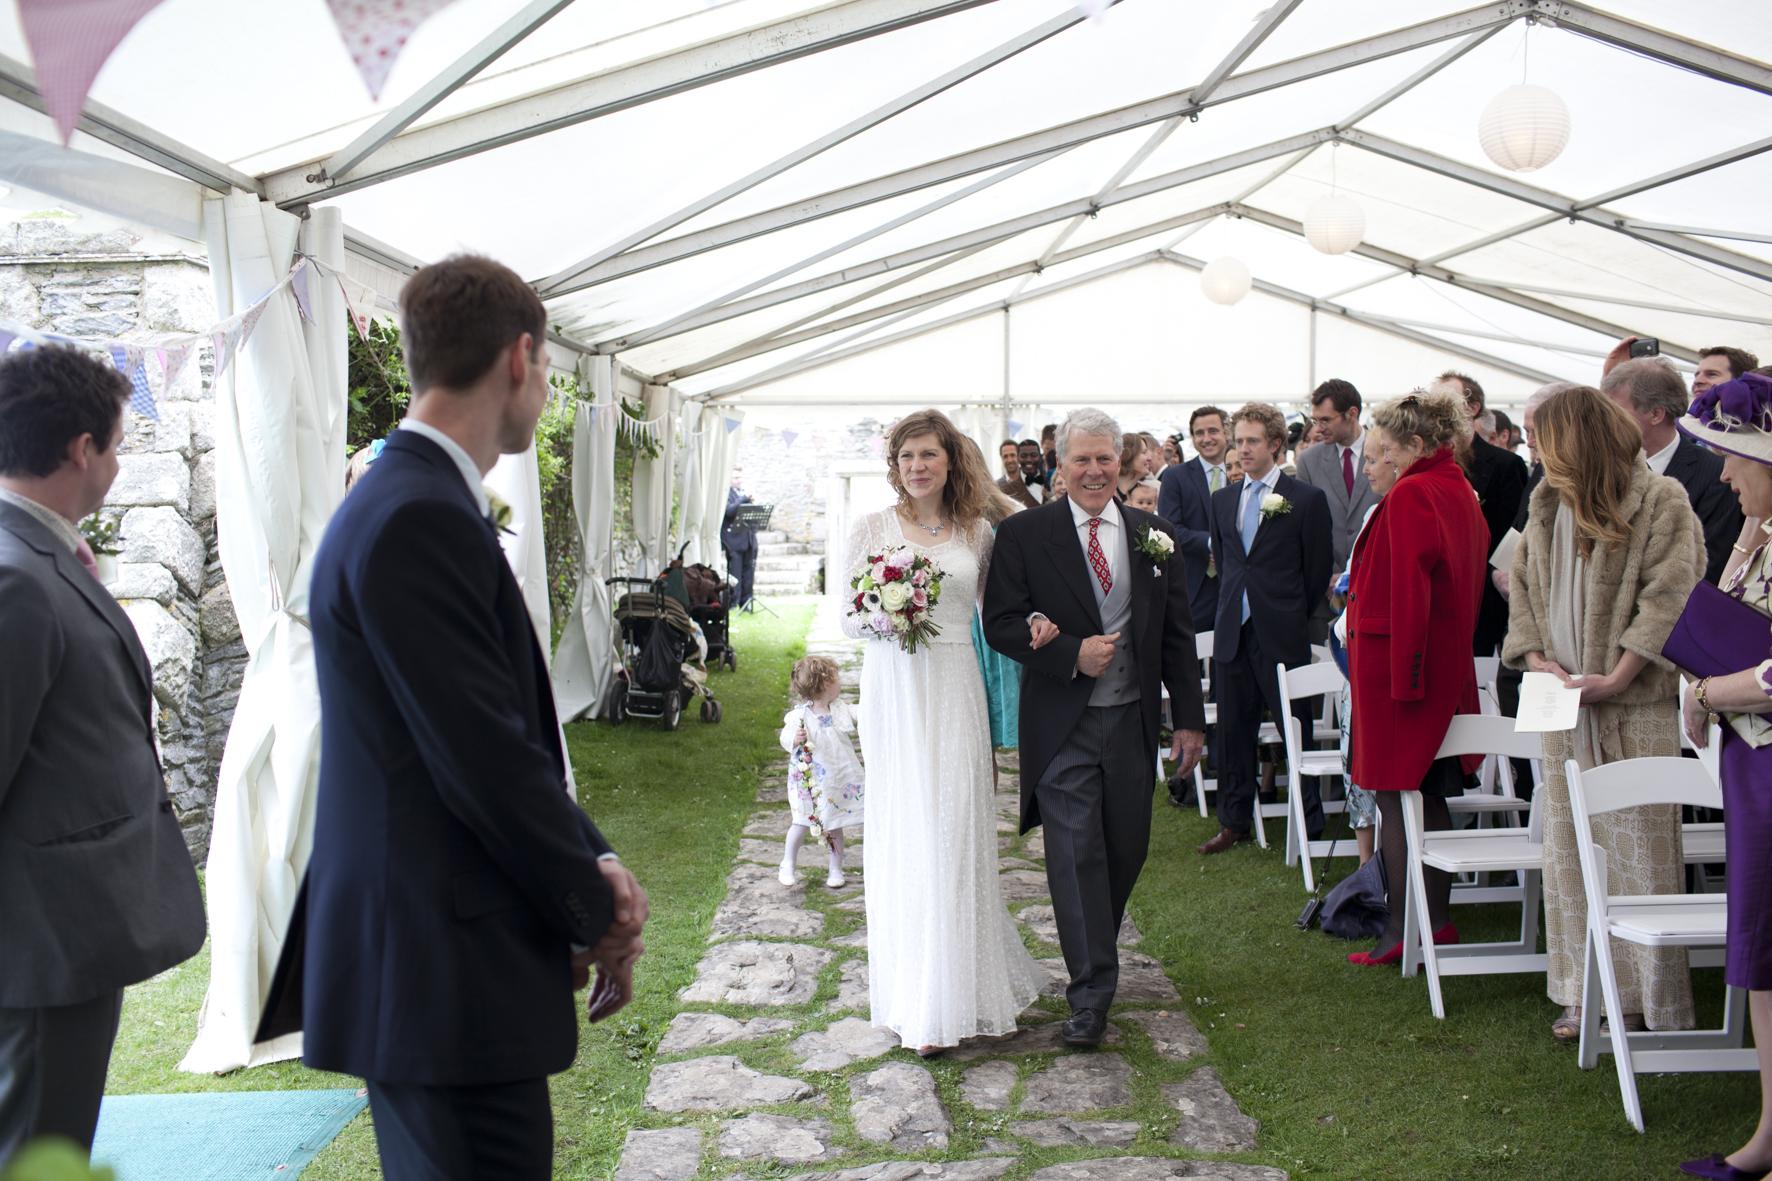 Wedding example_M&P__MG_3322_Claudia Leisinger.jpg